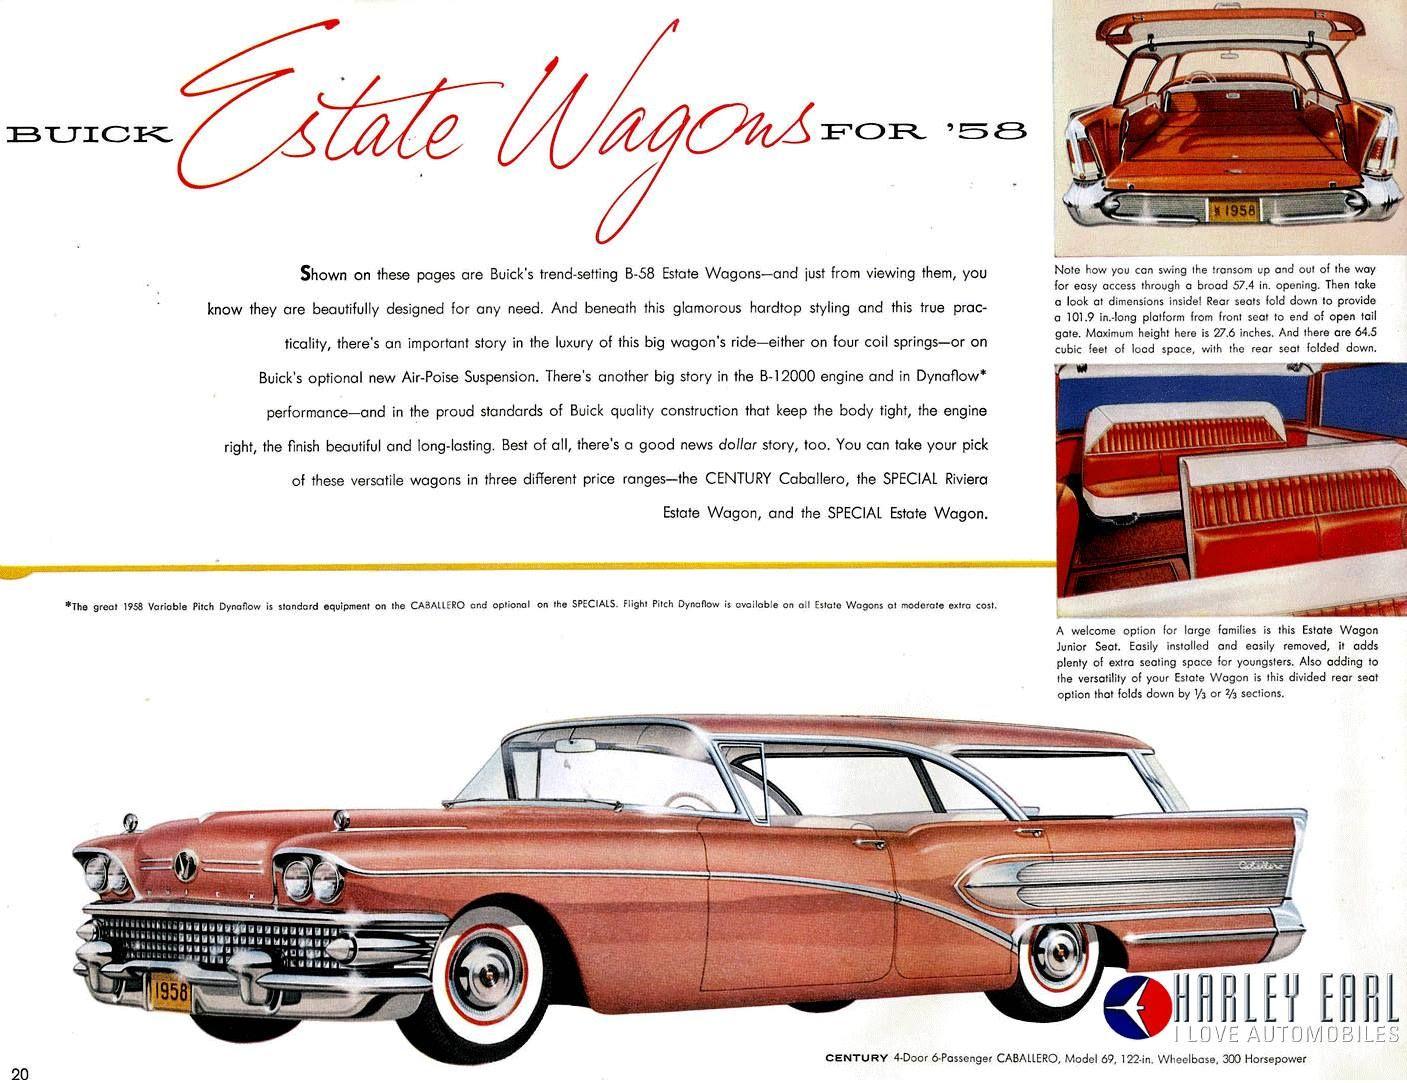 1956 ford customline wagon old car hunt - 1958 Buick Estate Wagon